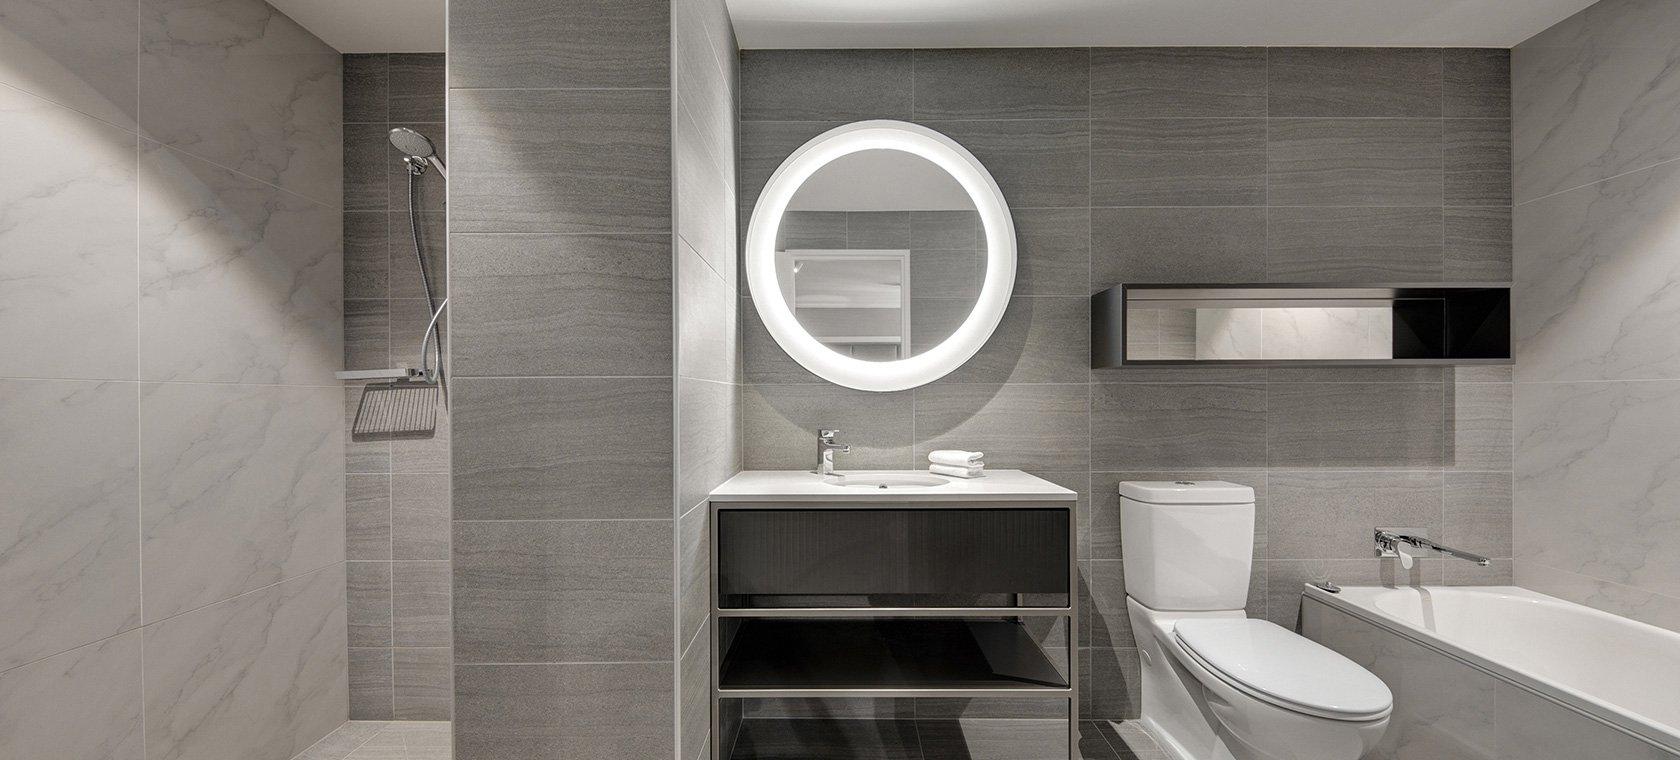 hotel-kurrajong-canberra-exectutive-suite-bathroom-2016.66-1.jpg